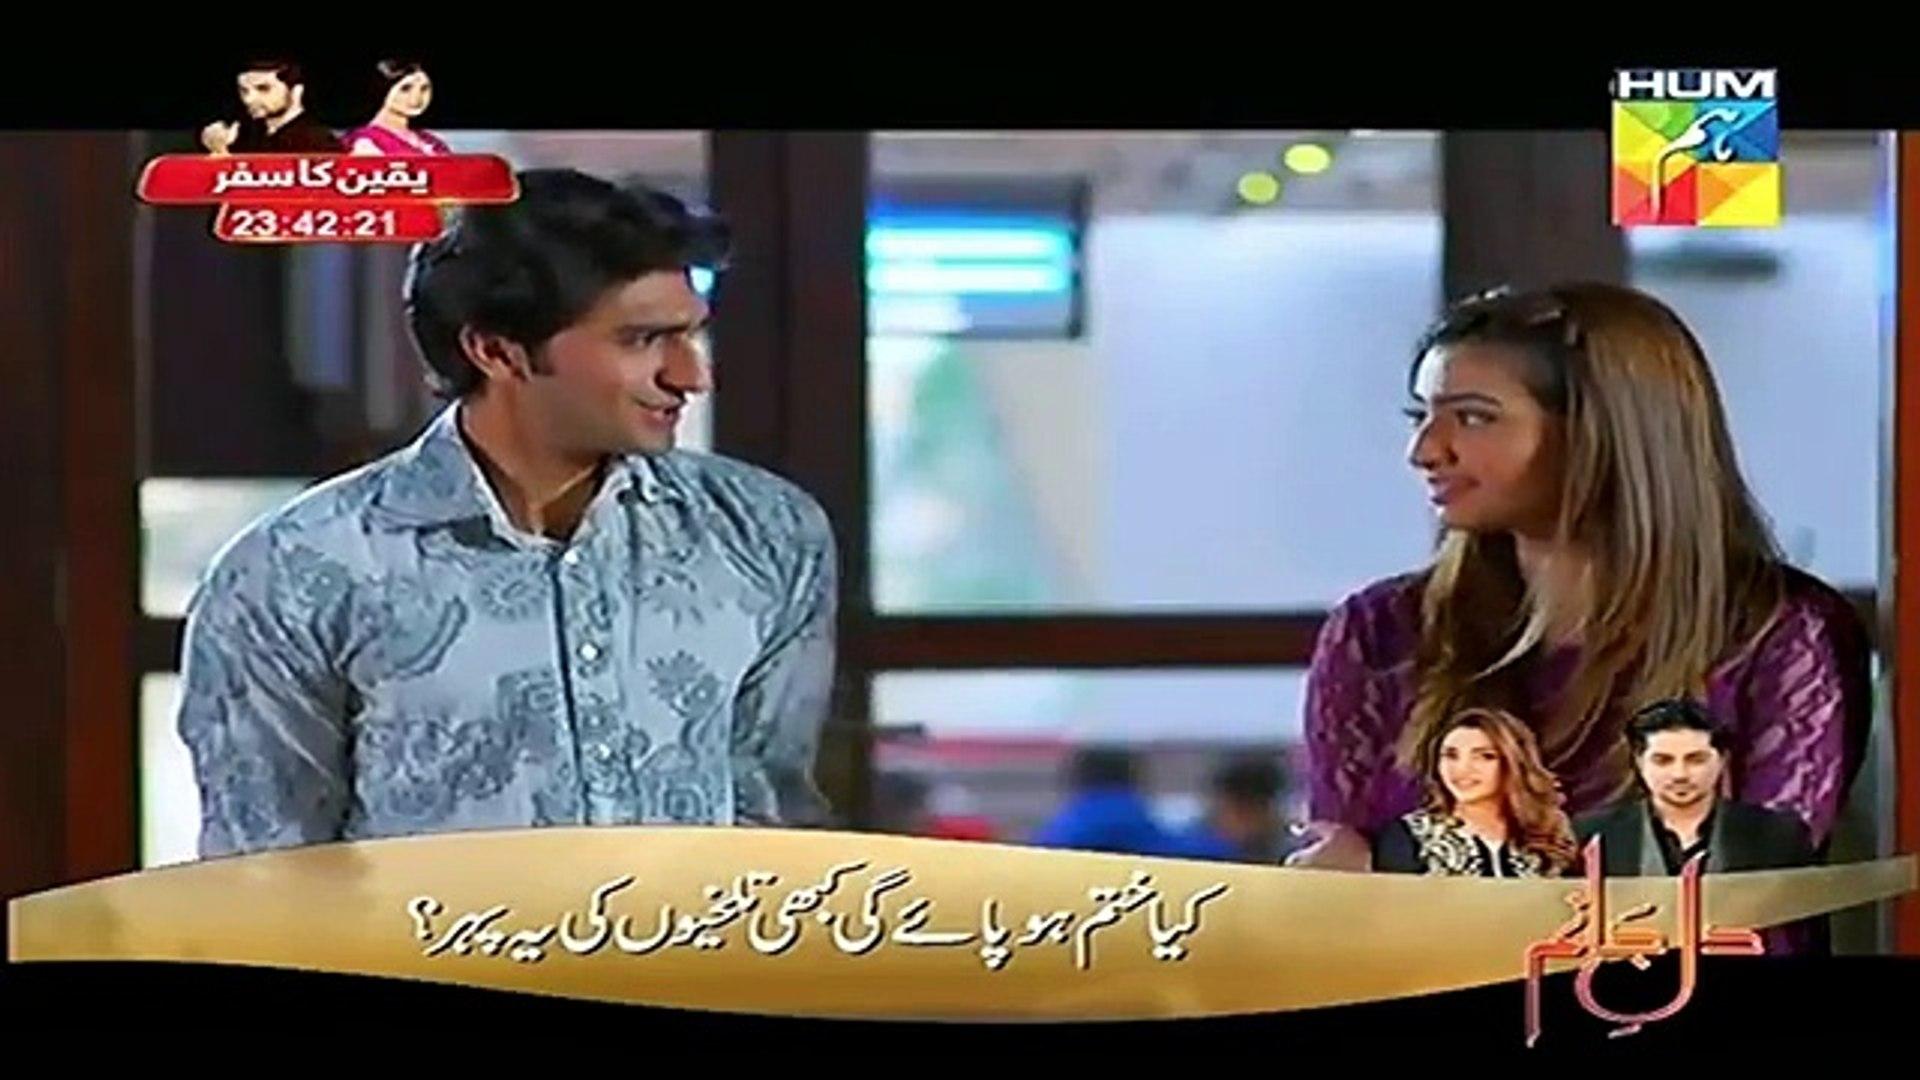 Choti Si Zindagi Last Episode Full Ham Tv 18 april 2017